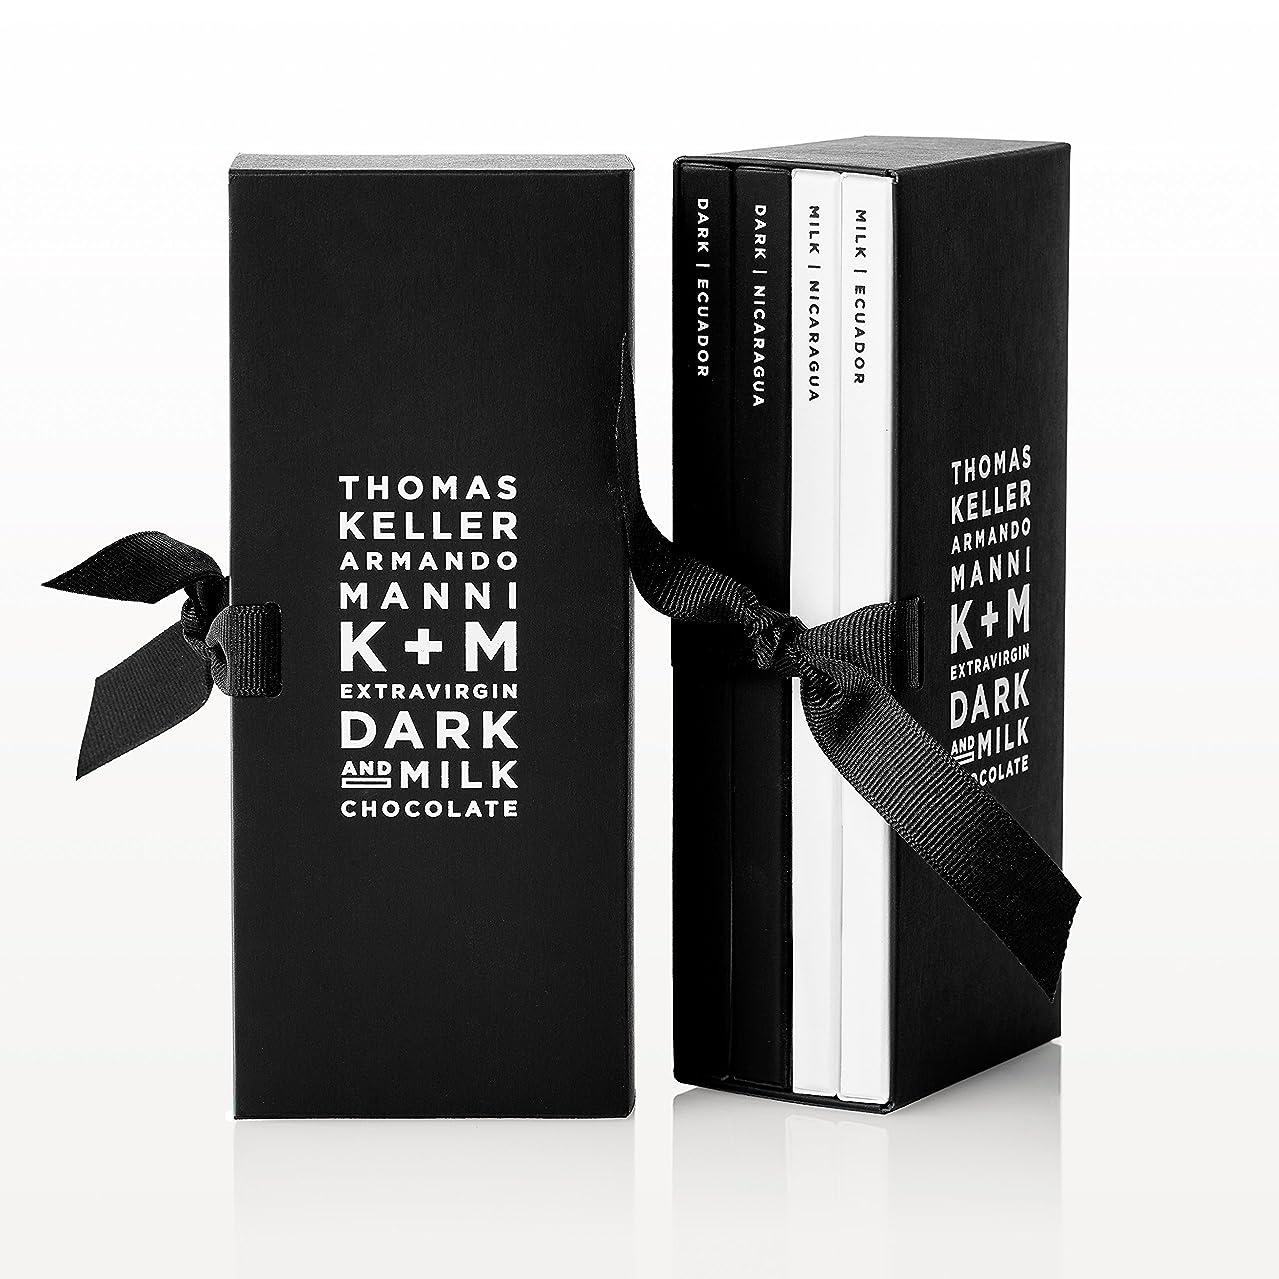 K+M Extravirgin Dark+Milk Four-Pack Gift Box Set